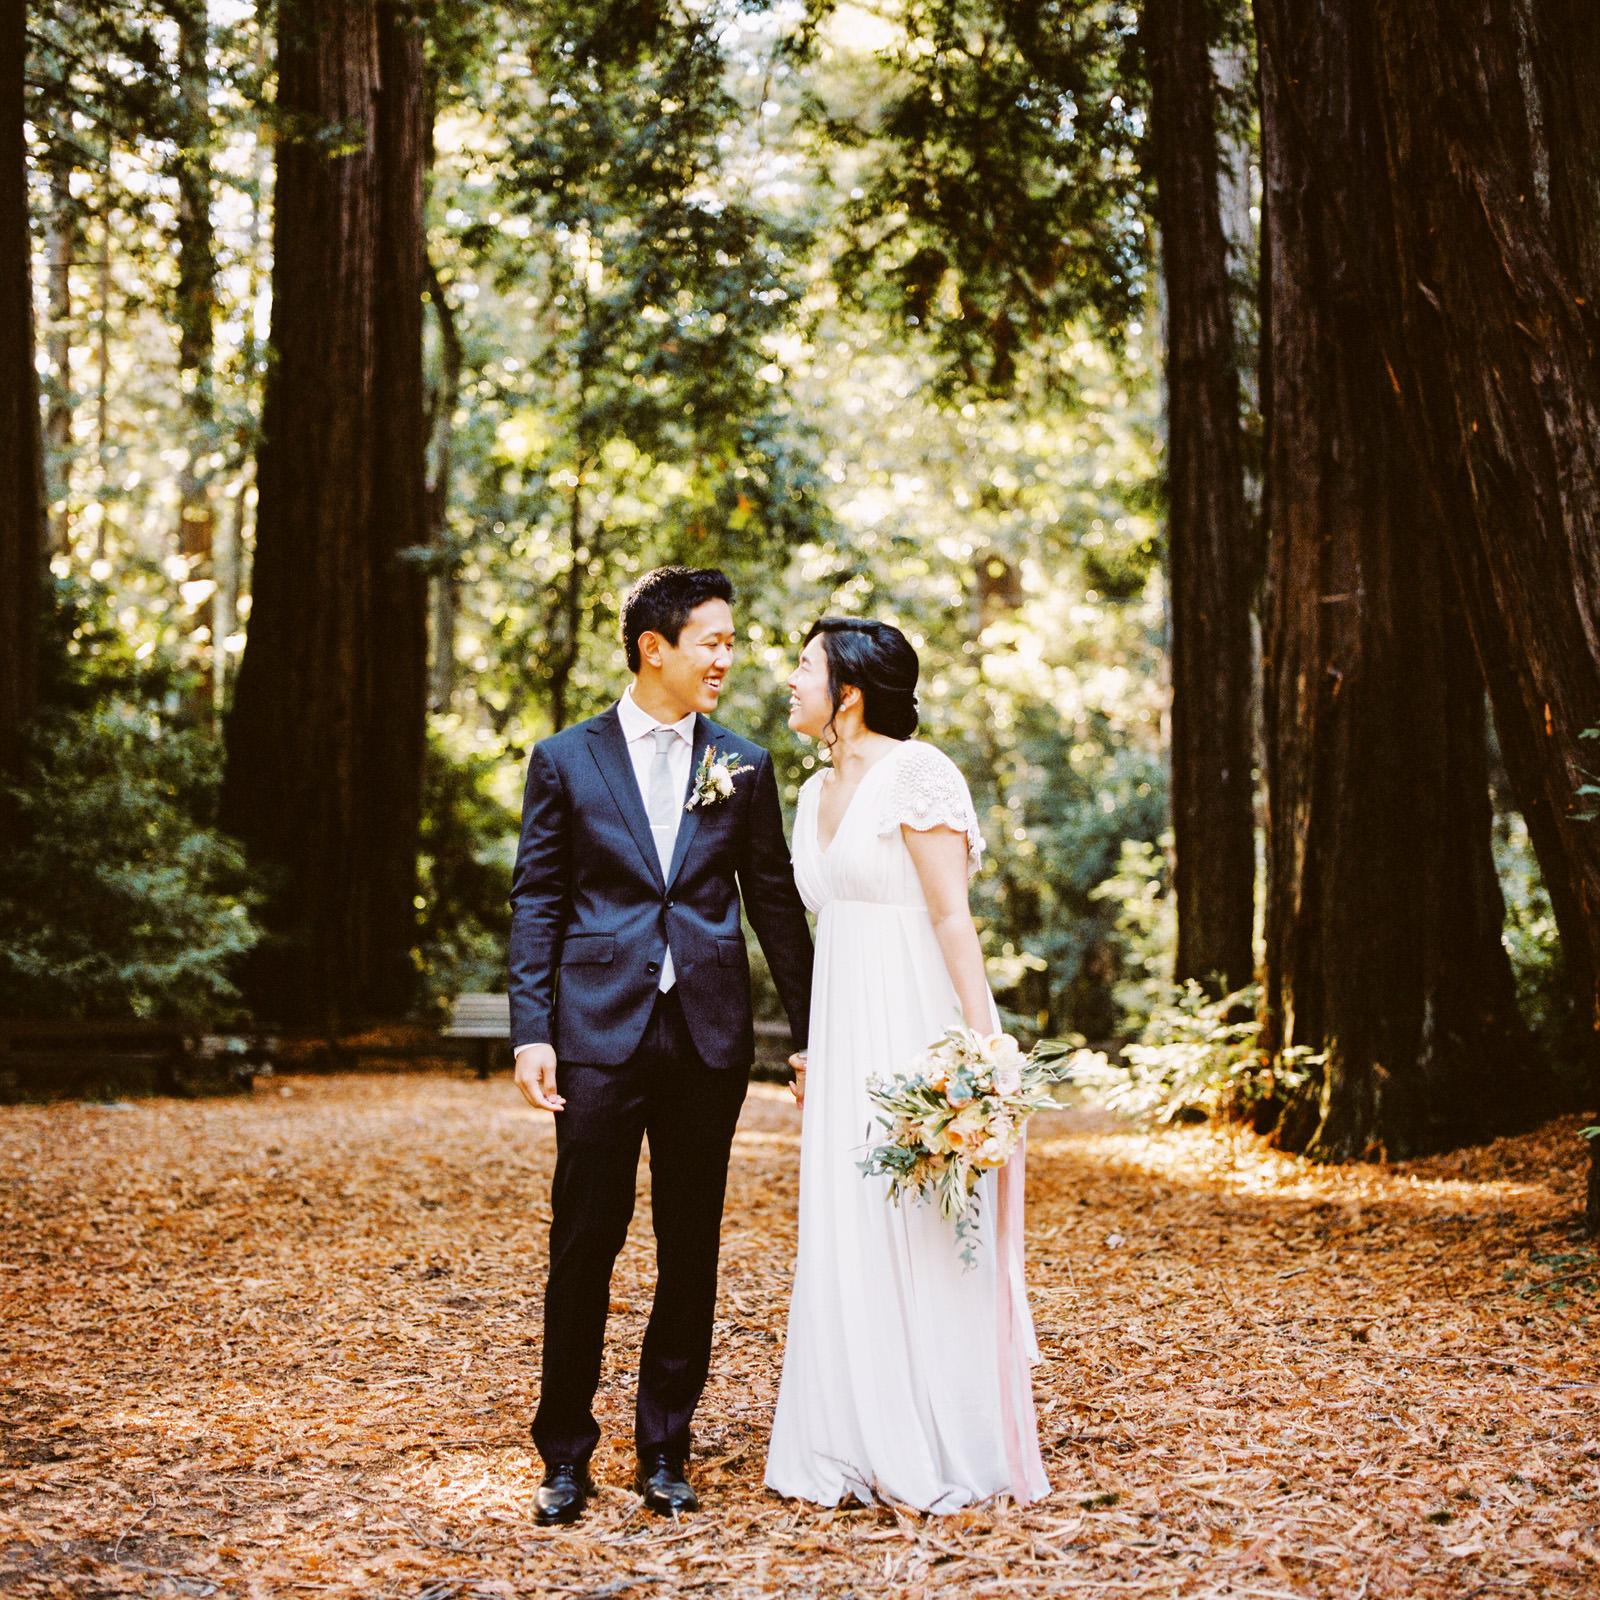 kimclay-blog-007 REDWOOD FOREST WEDDING